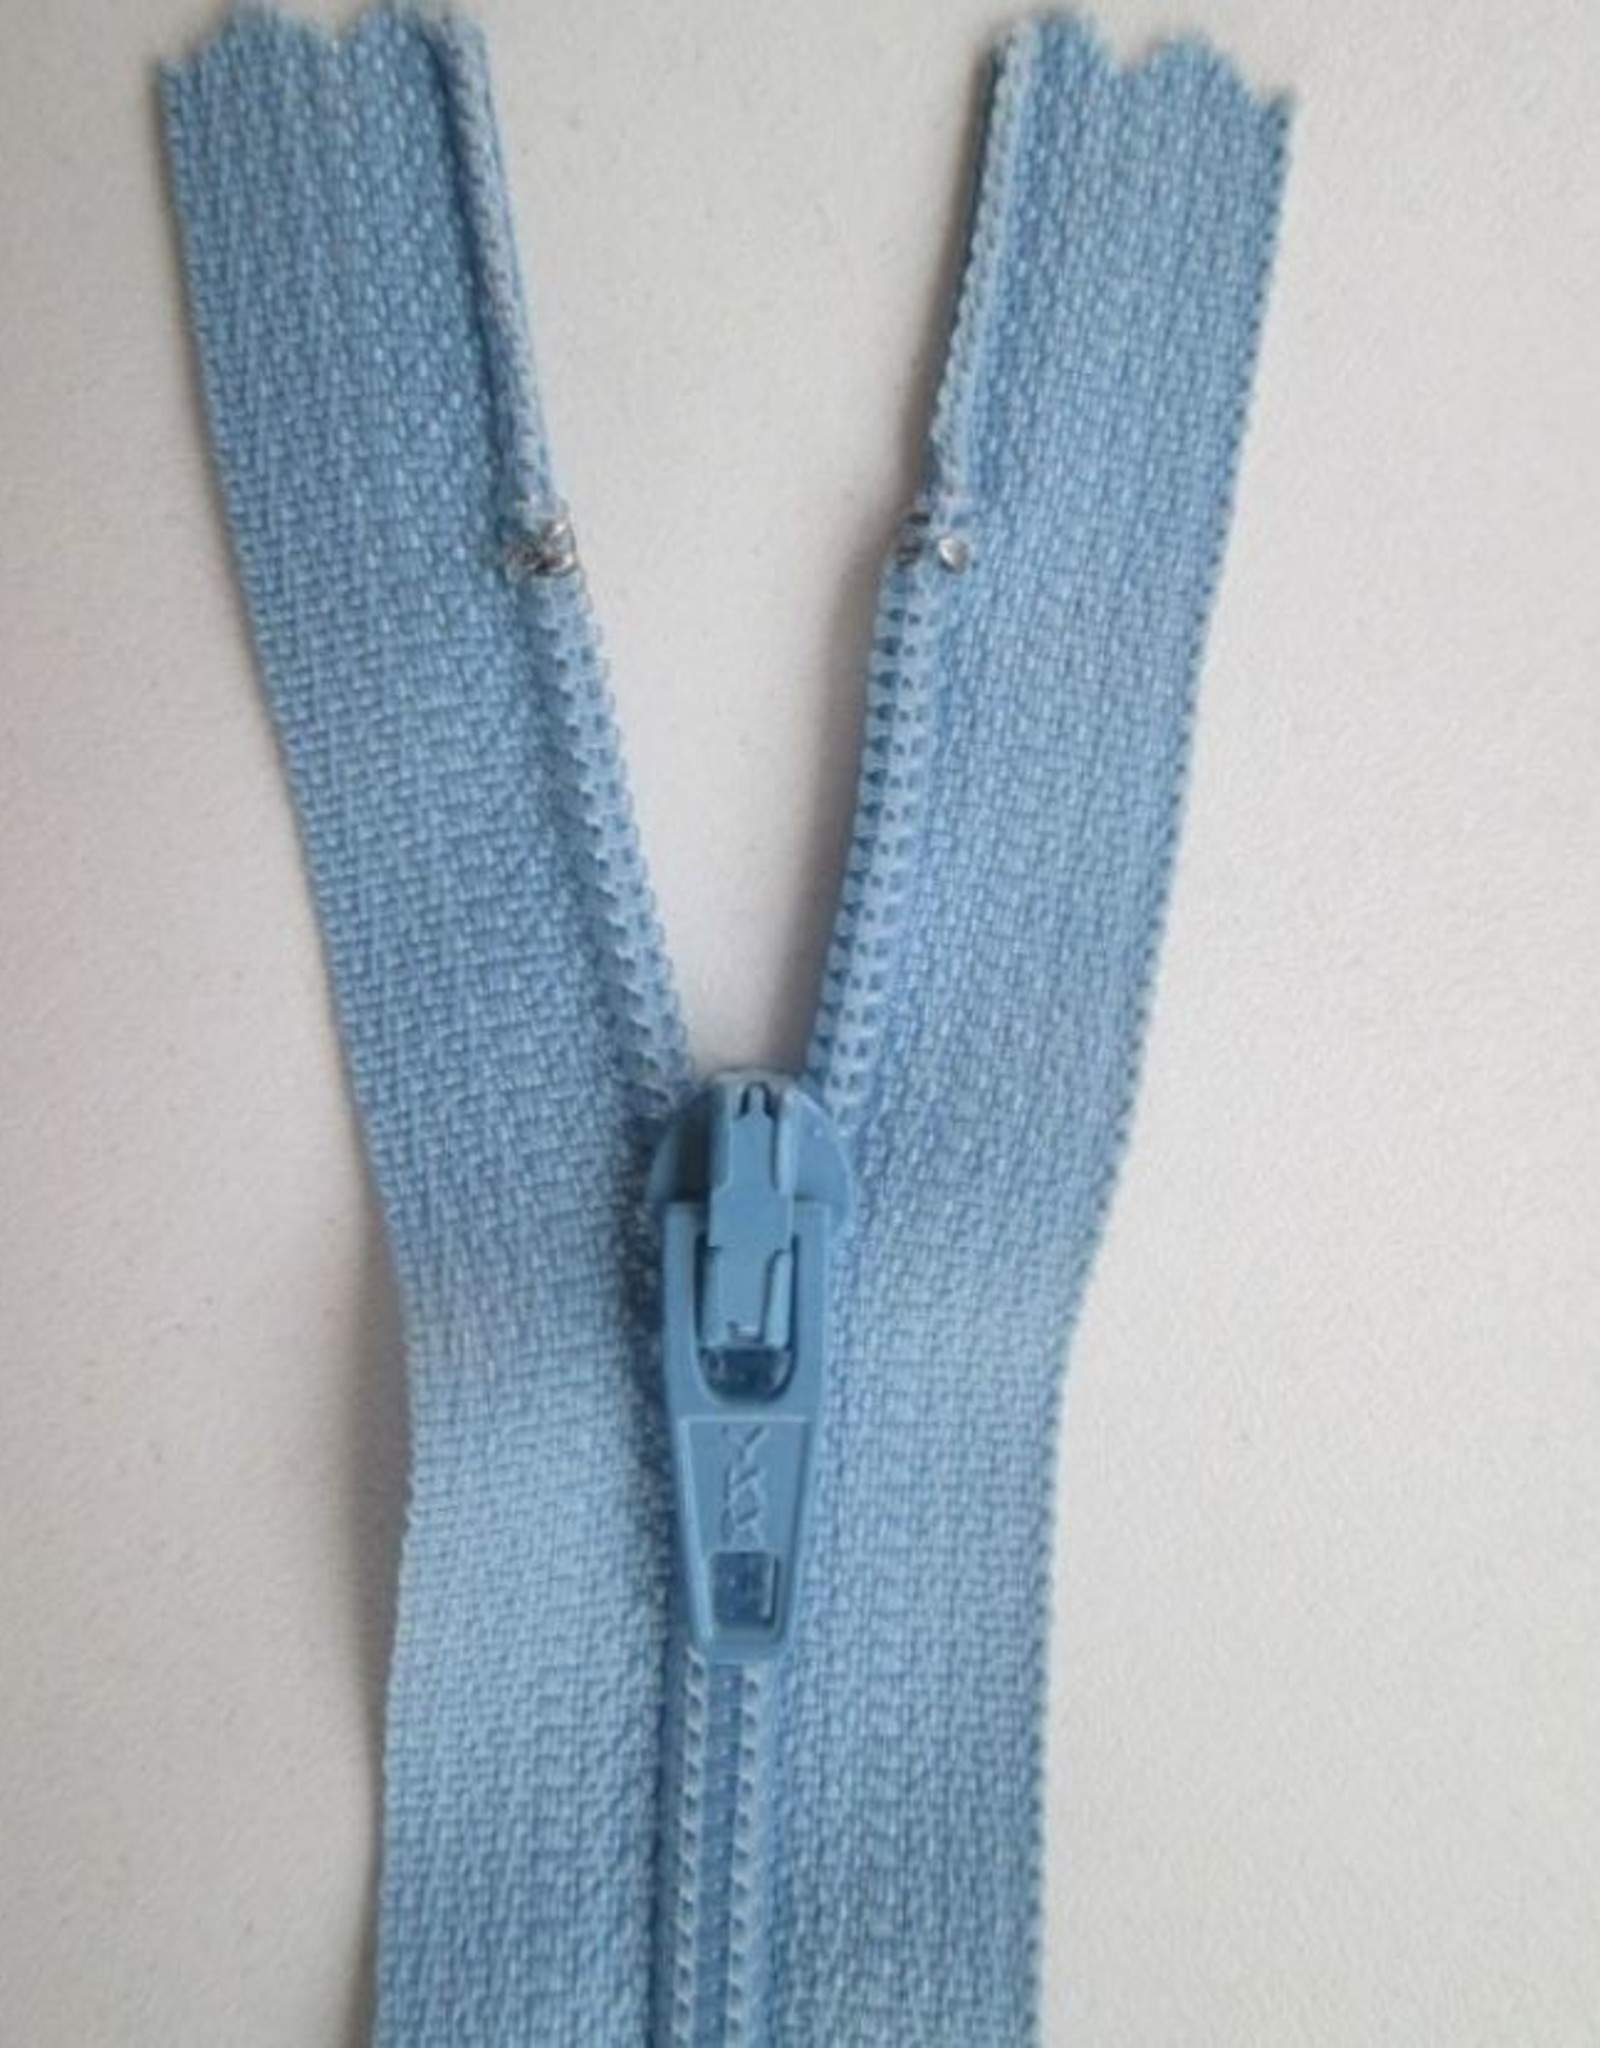 YKK Spiraalrits niet-DB 3mm midden blauw 546-20cm